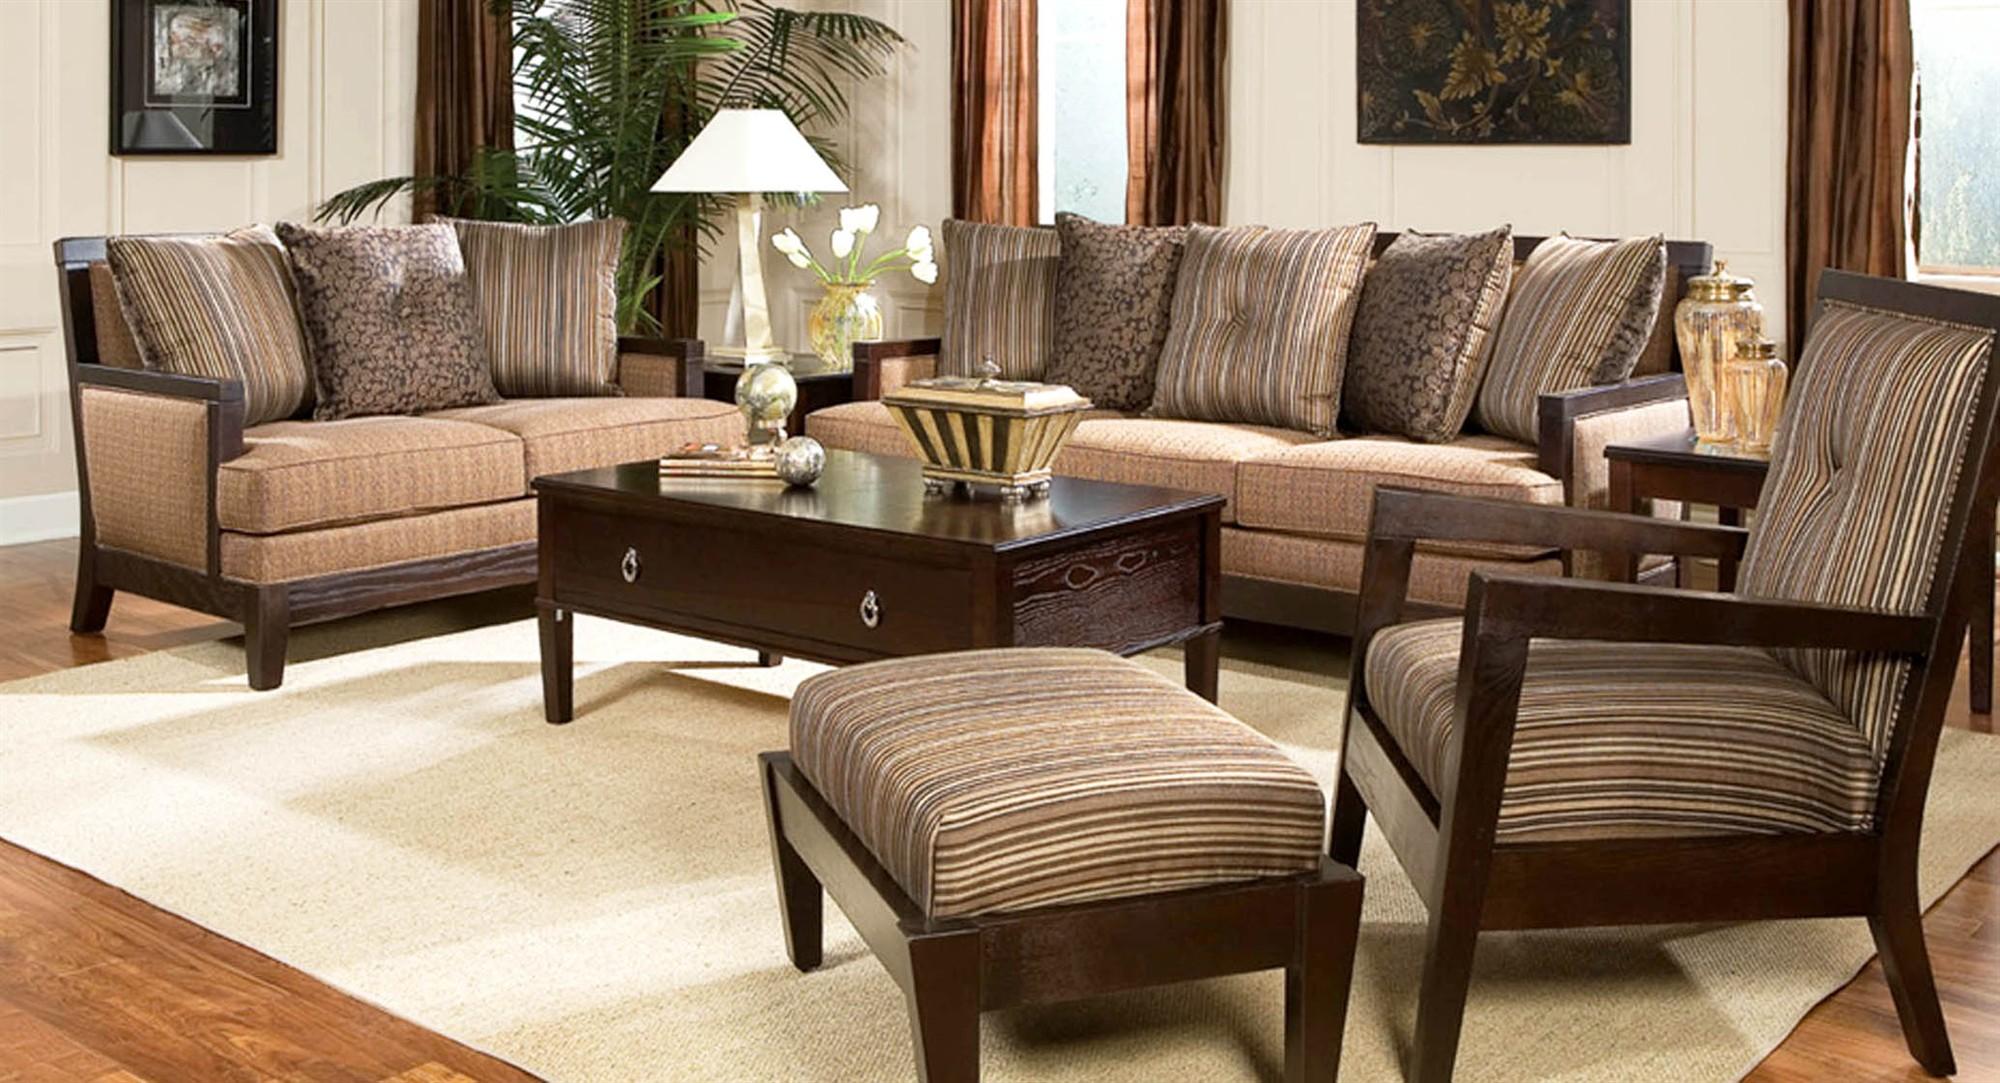 living room furniture sets inspiration decoration for living room interior  design styles MPMTPFR